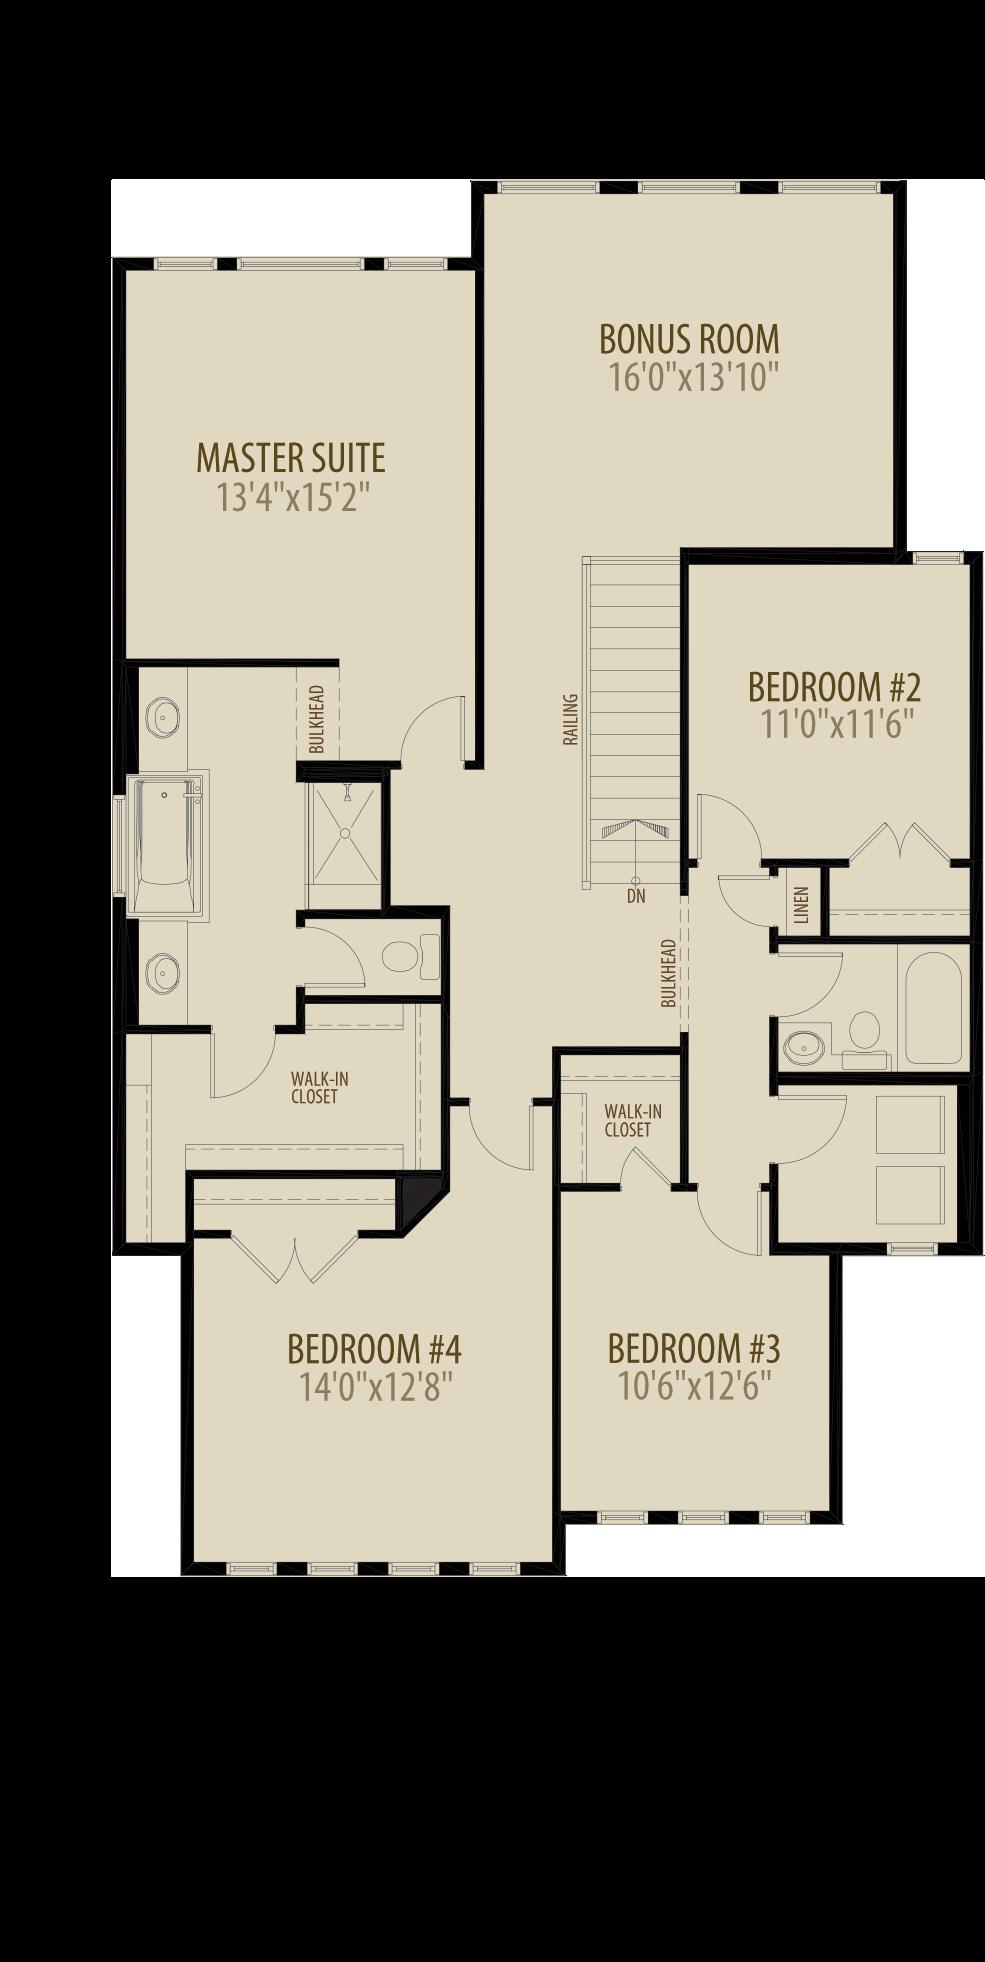 4th Bedroom and Bonus Room adds 270 sq ft